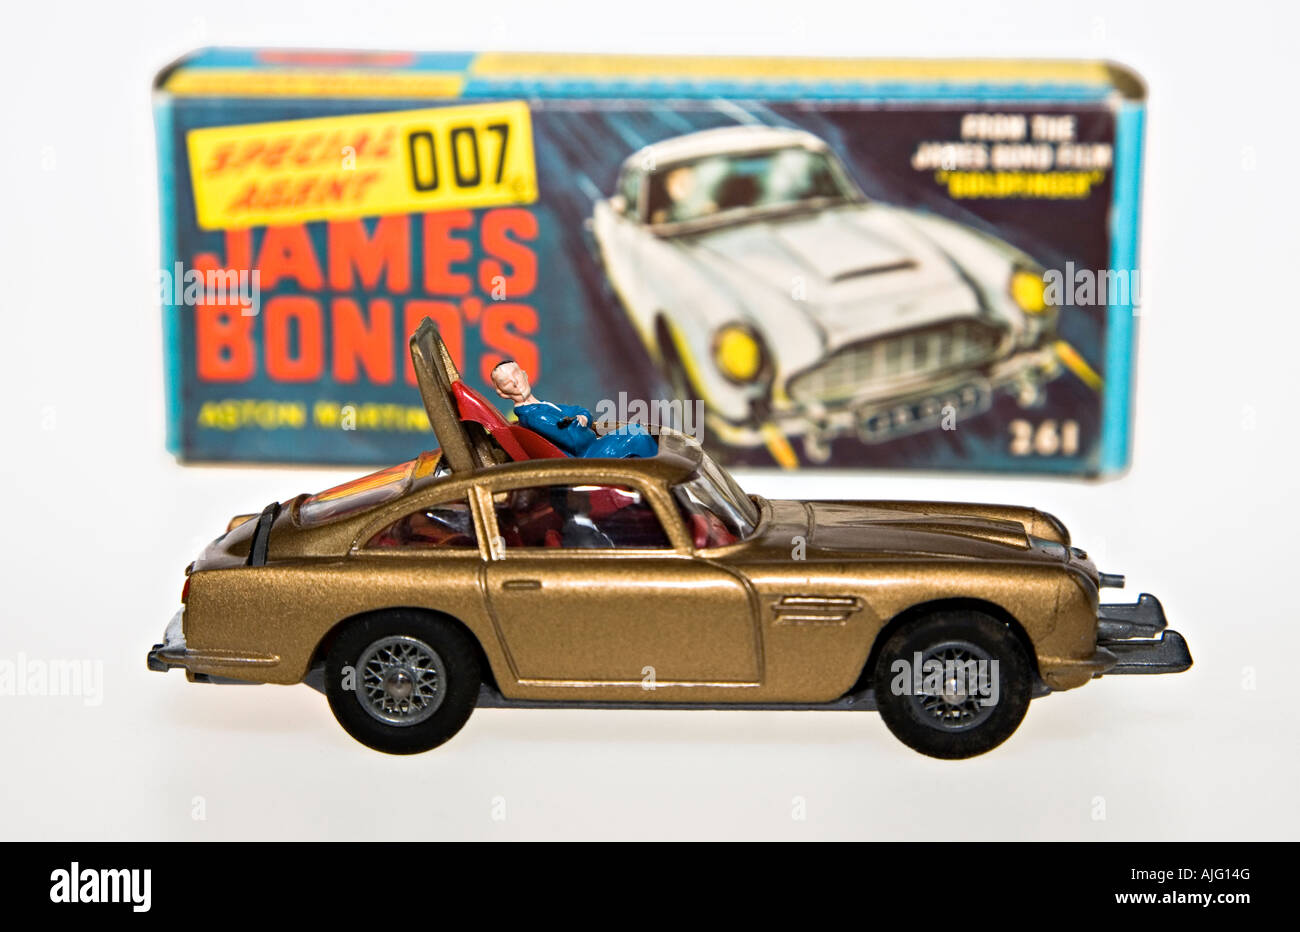 corgi modellauto james bond 007 aston martin db5 mit. Black Bedroom Furniture Sets. Home Design Ideas